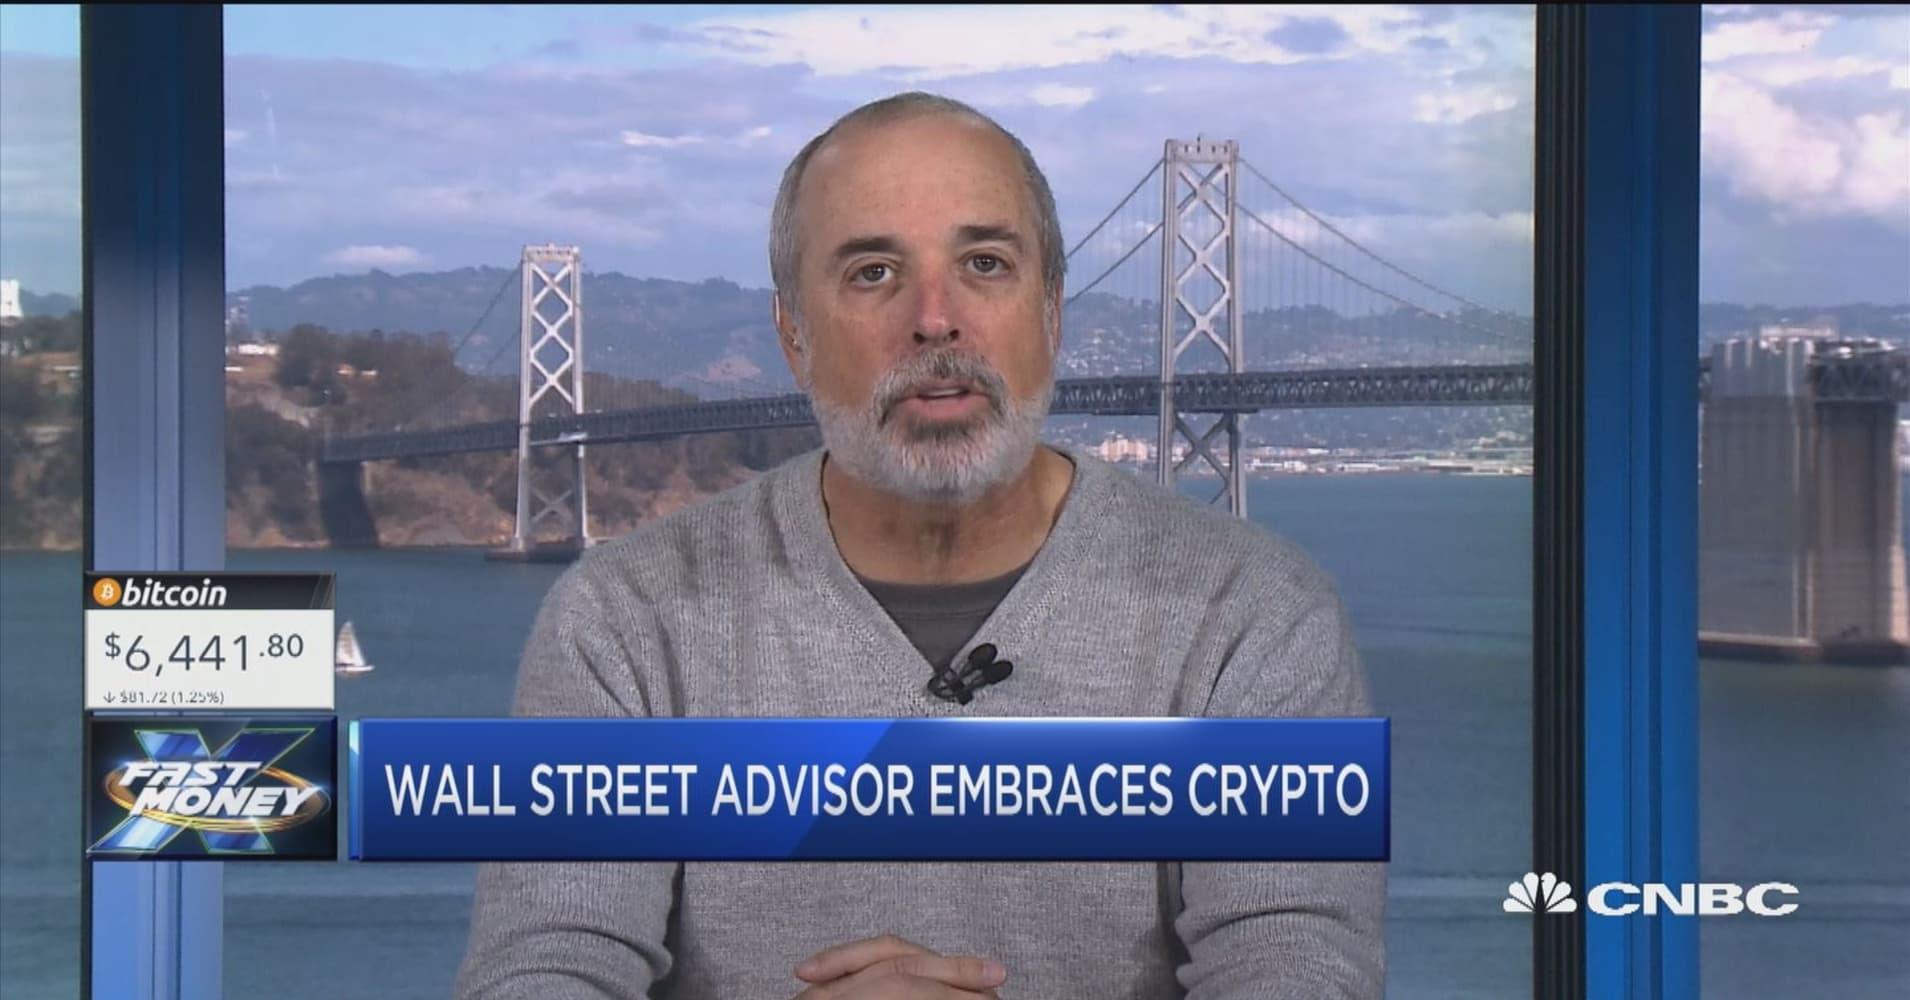 Top Wall Street advisor Ric Edelman embracing crypto